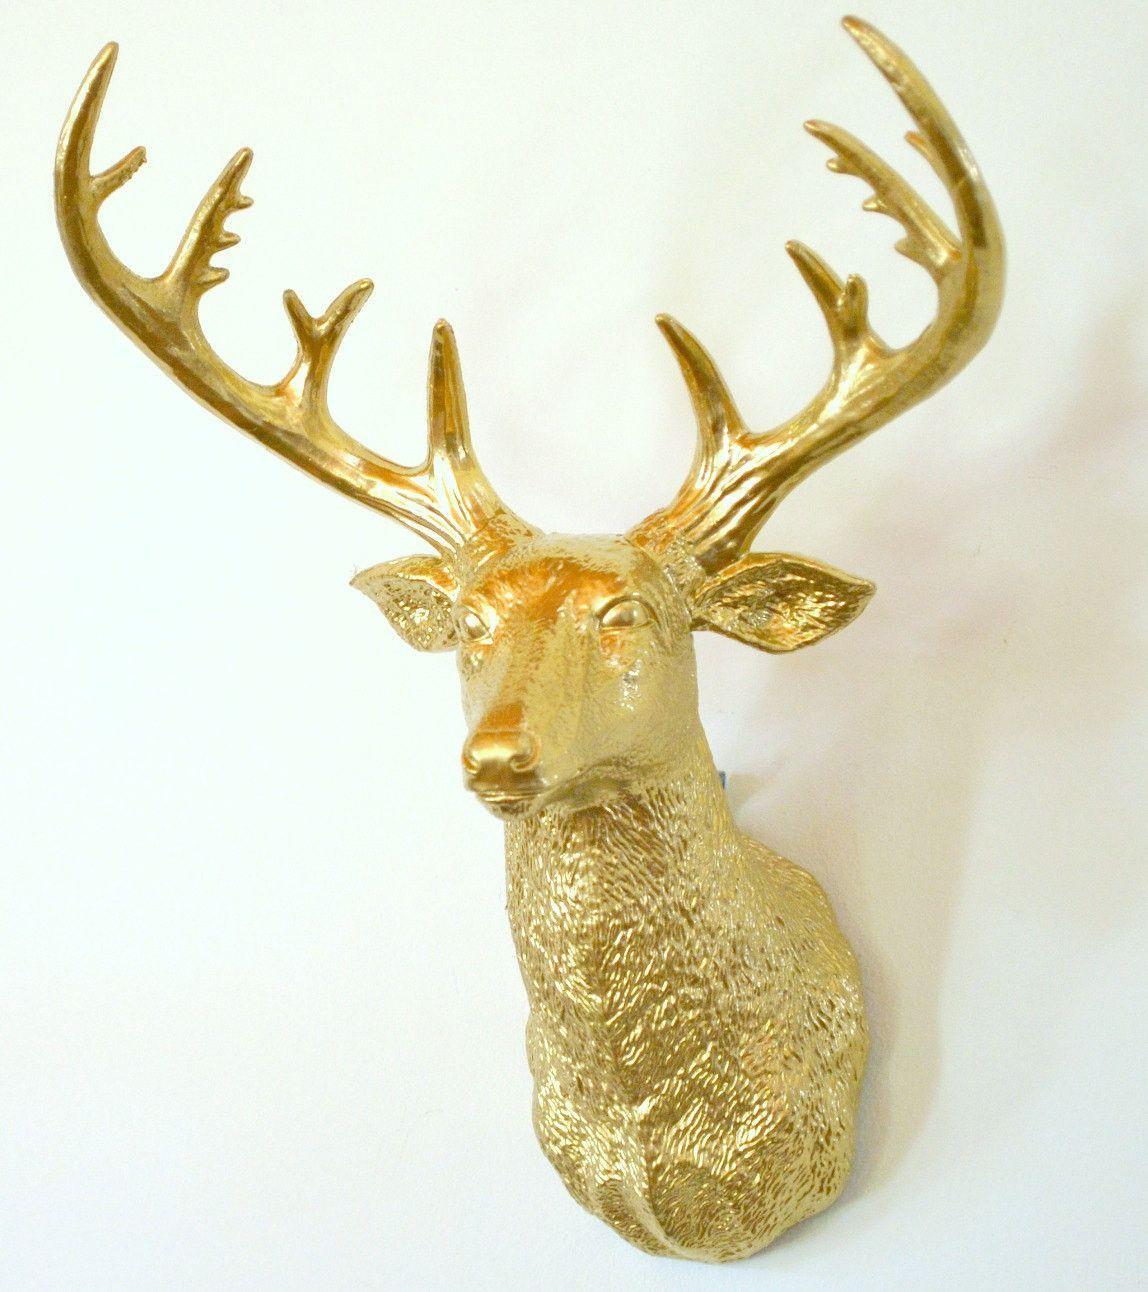 Faux Deer Head - Gold Deer Head | Products | Pinterest | Faux deer ...